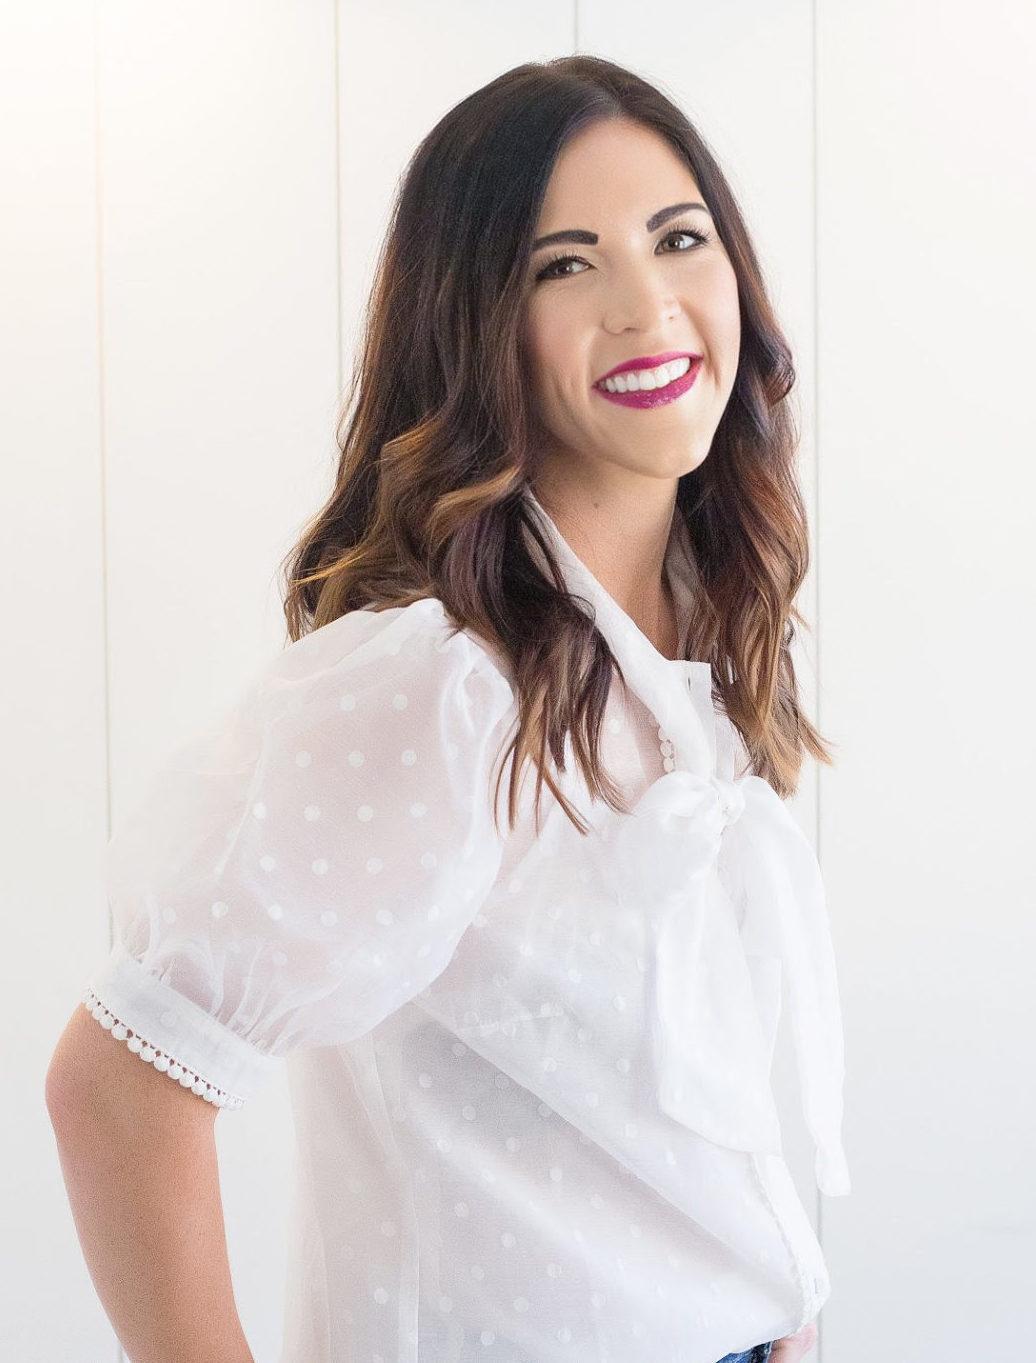 Kara Bellino, real estate agent, omaha nebraska, the key group, timeless custom homes realtor, new construction realtor